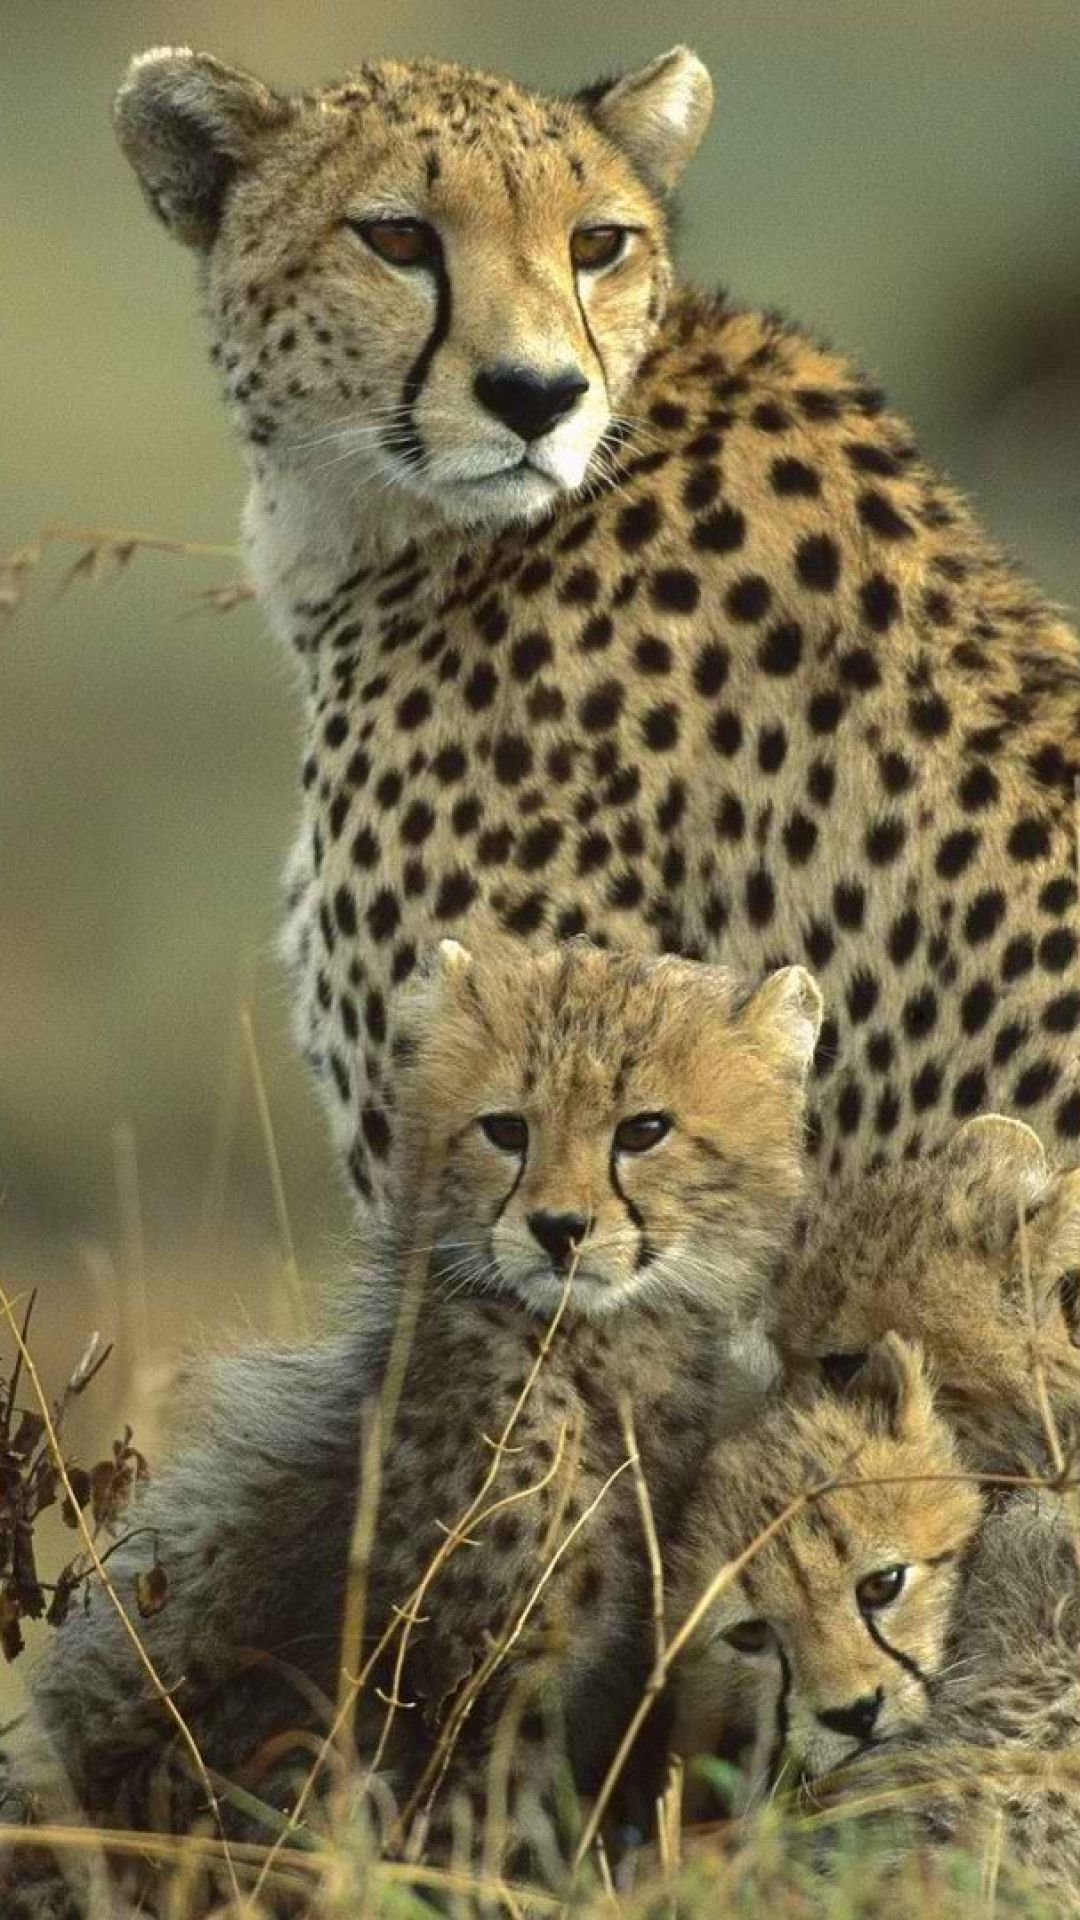 Cheetahs. M. Taylor I just LOVE Cheetahs,especially those